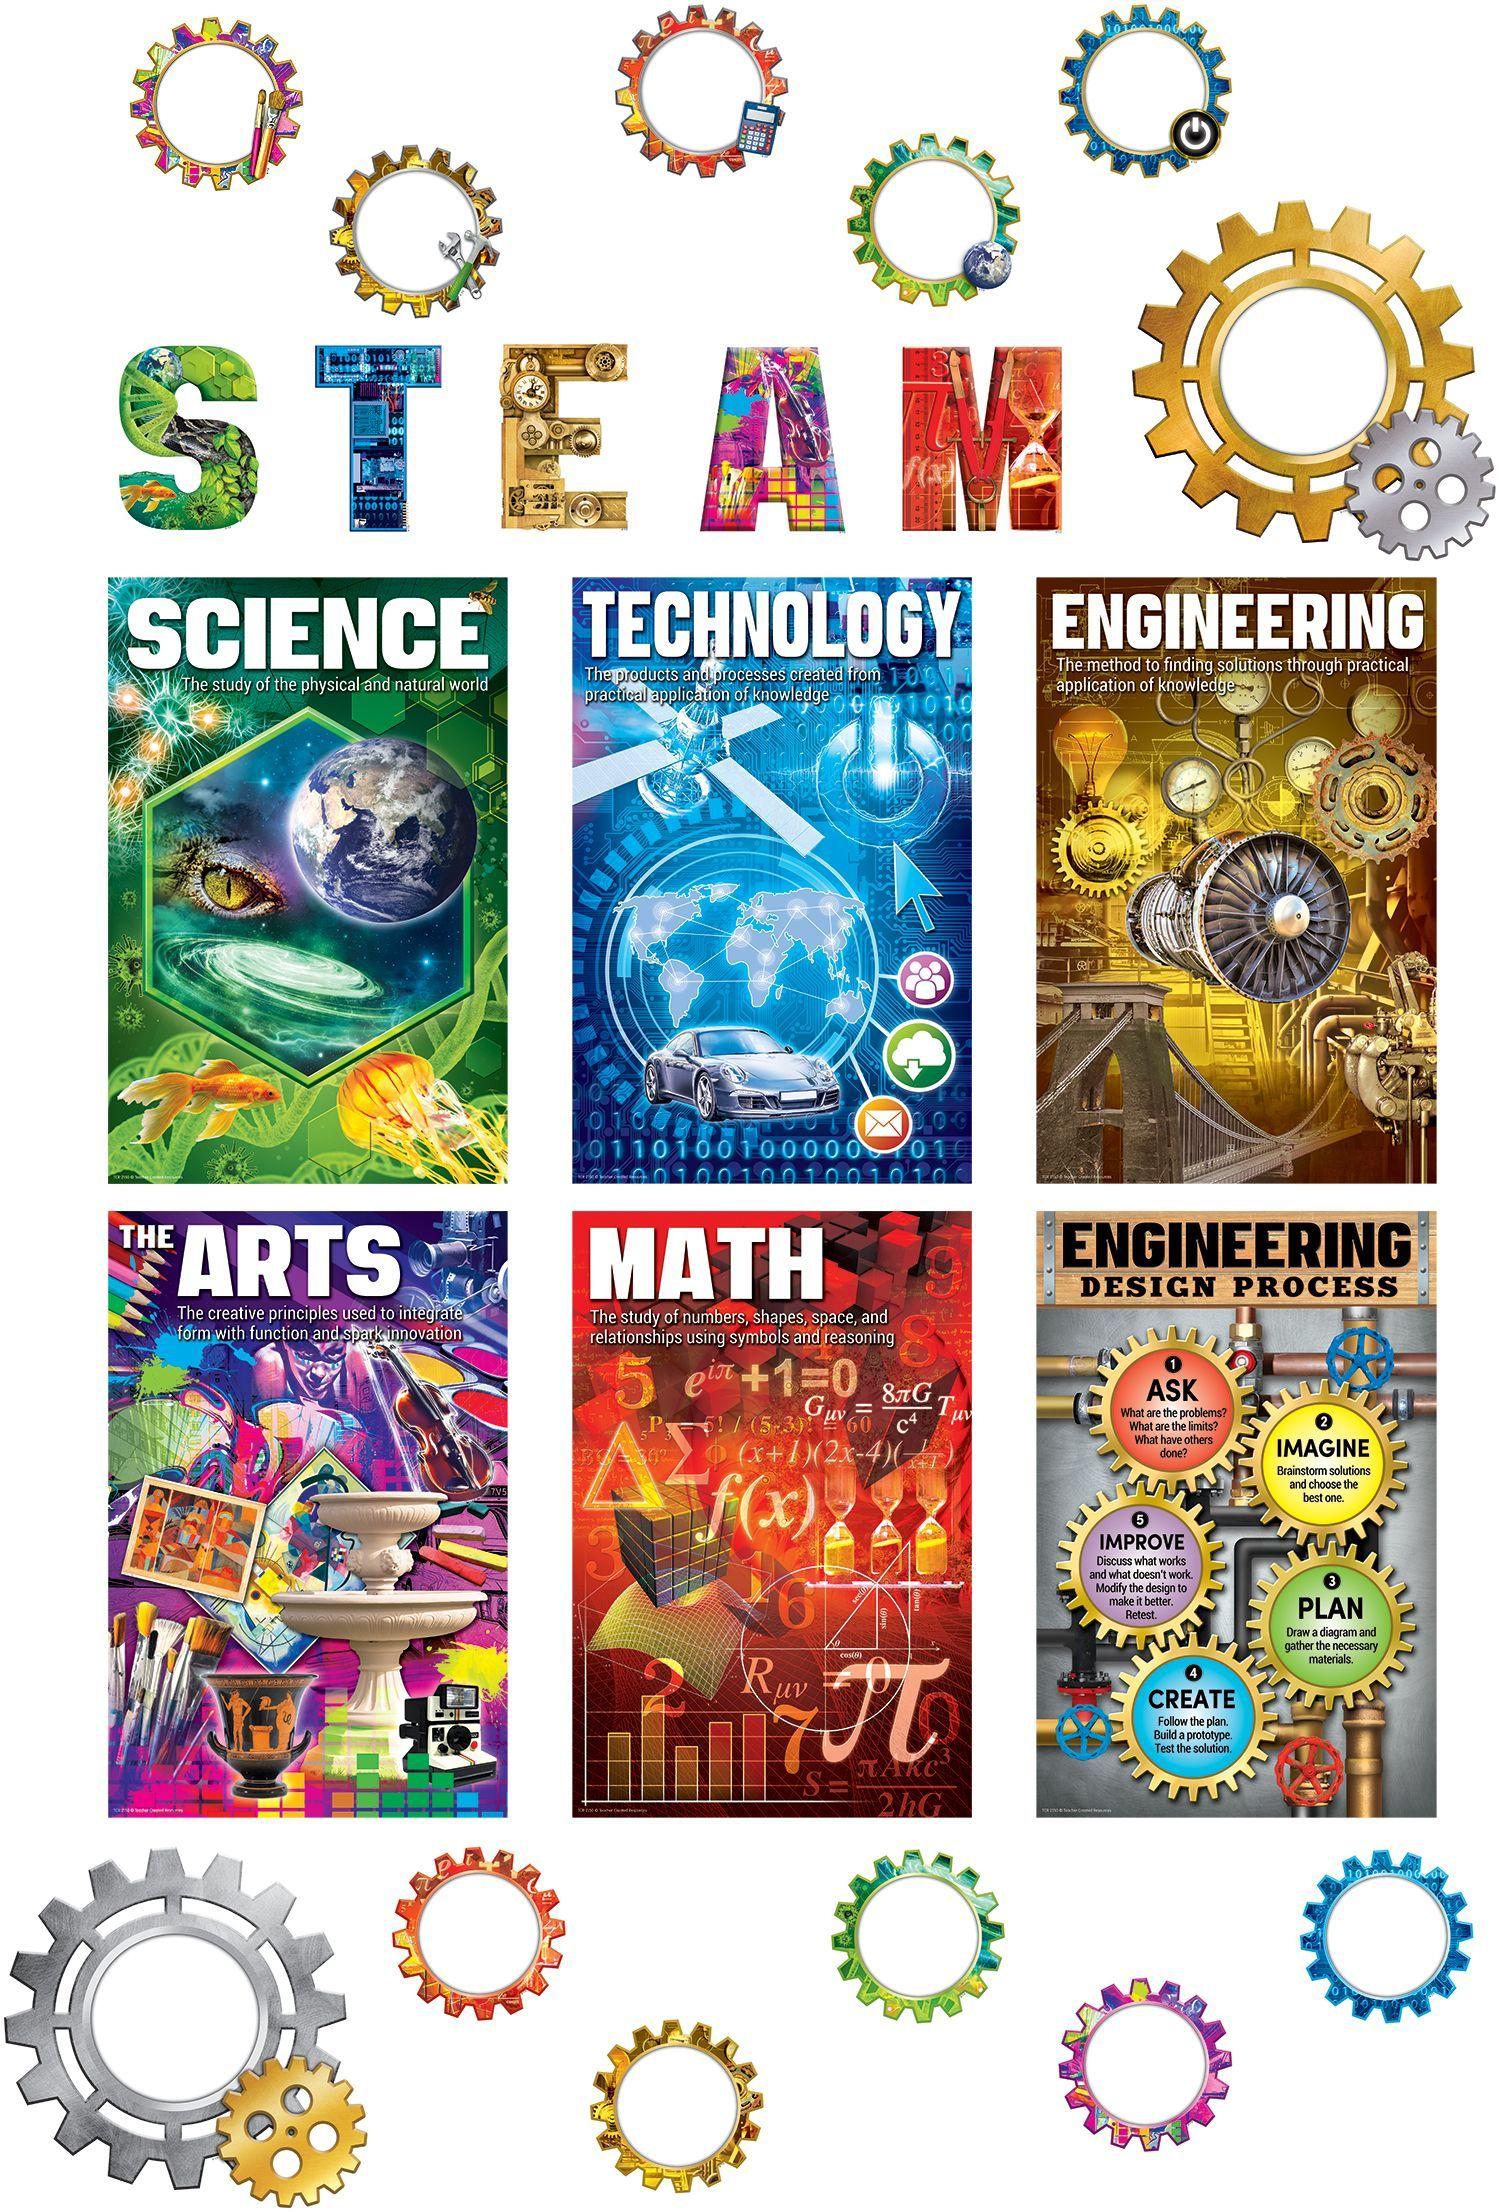 Steam Bulletin Board Engineering Design Process Math Design Bulletin Board Sets